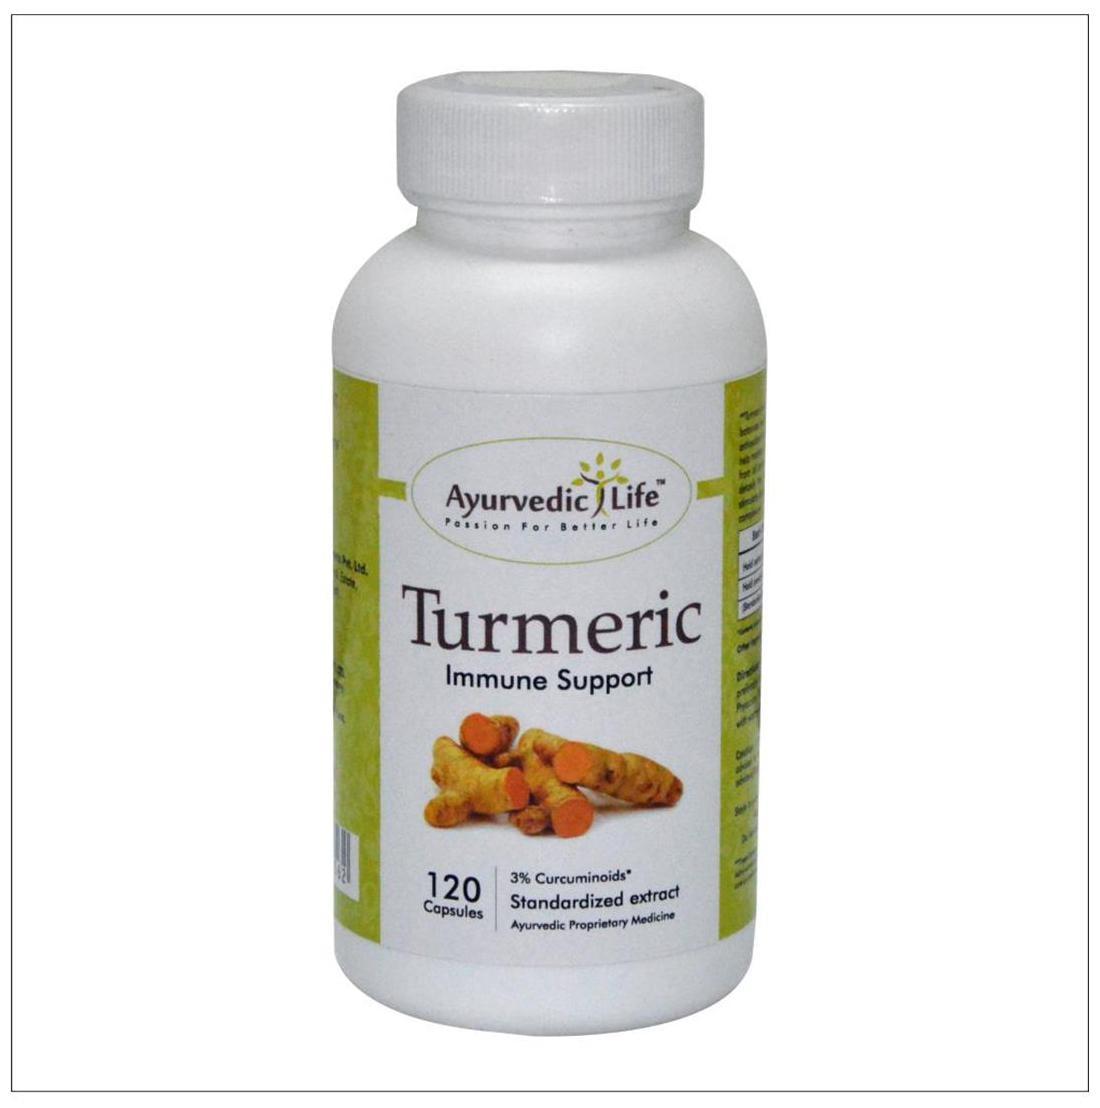 Pharma Feldene Sublingual Preco Droga Raia Artane Or Cogentin Lukol De Himalaya Para Que Sirve Anafranil 25 Mg Preco Bula